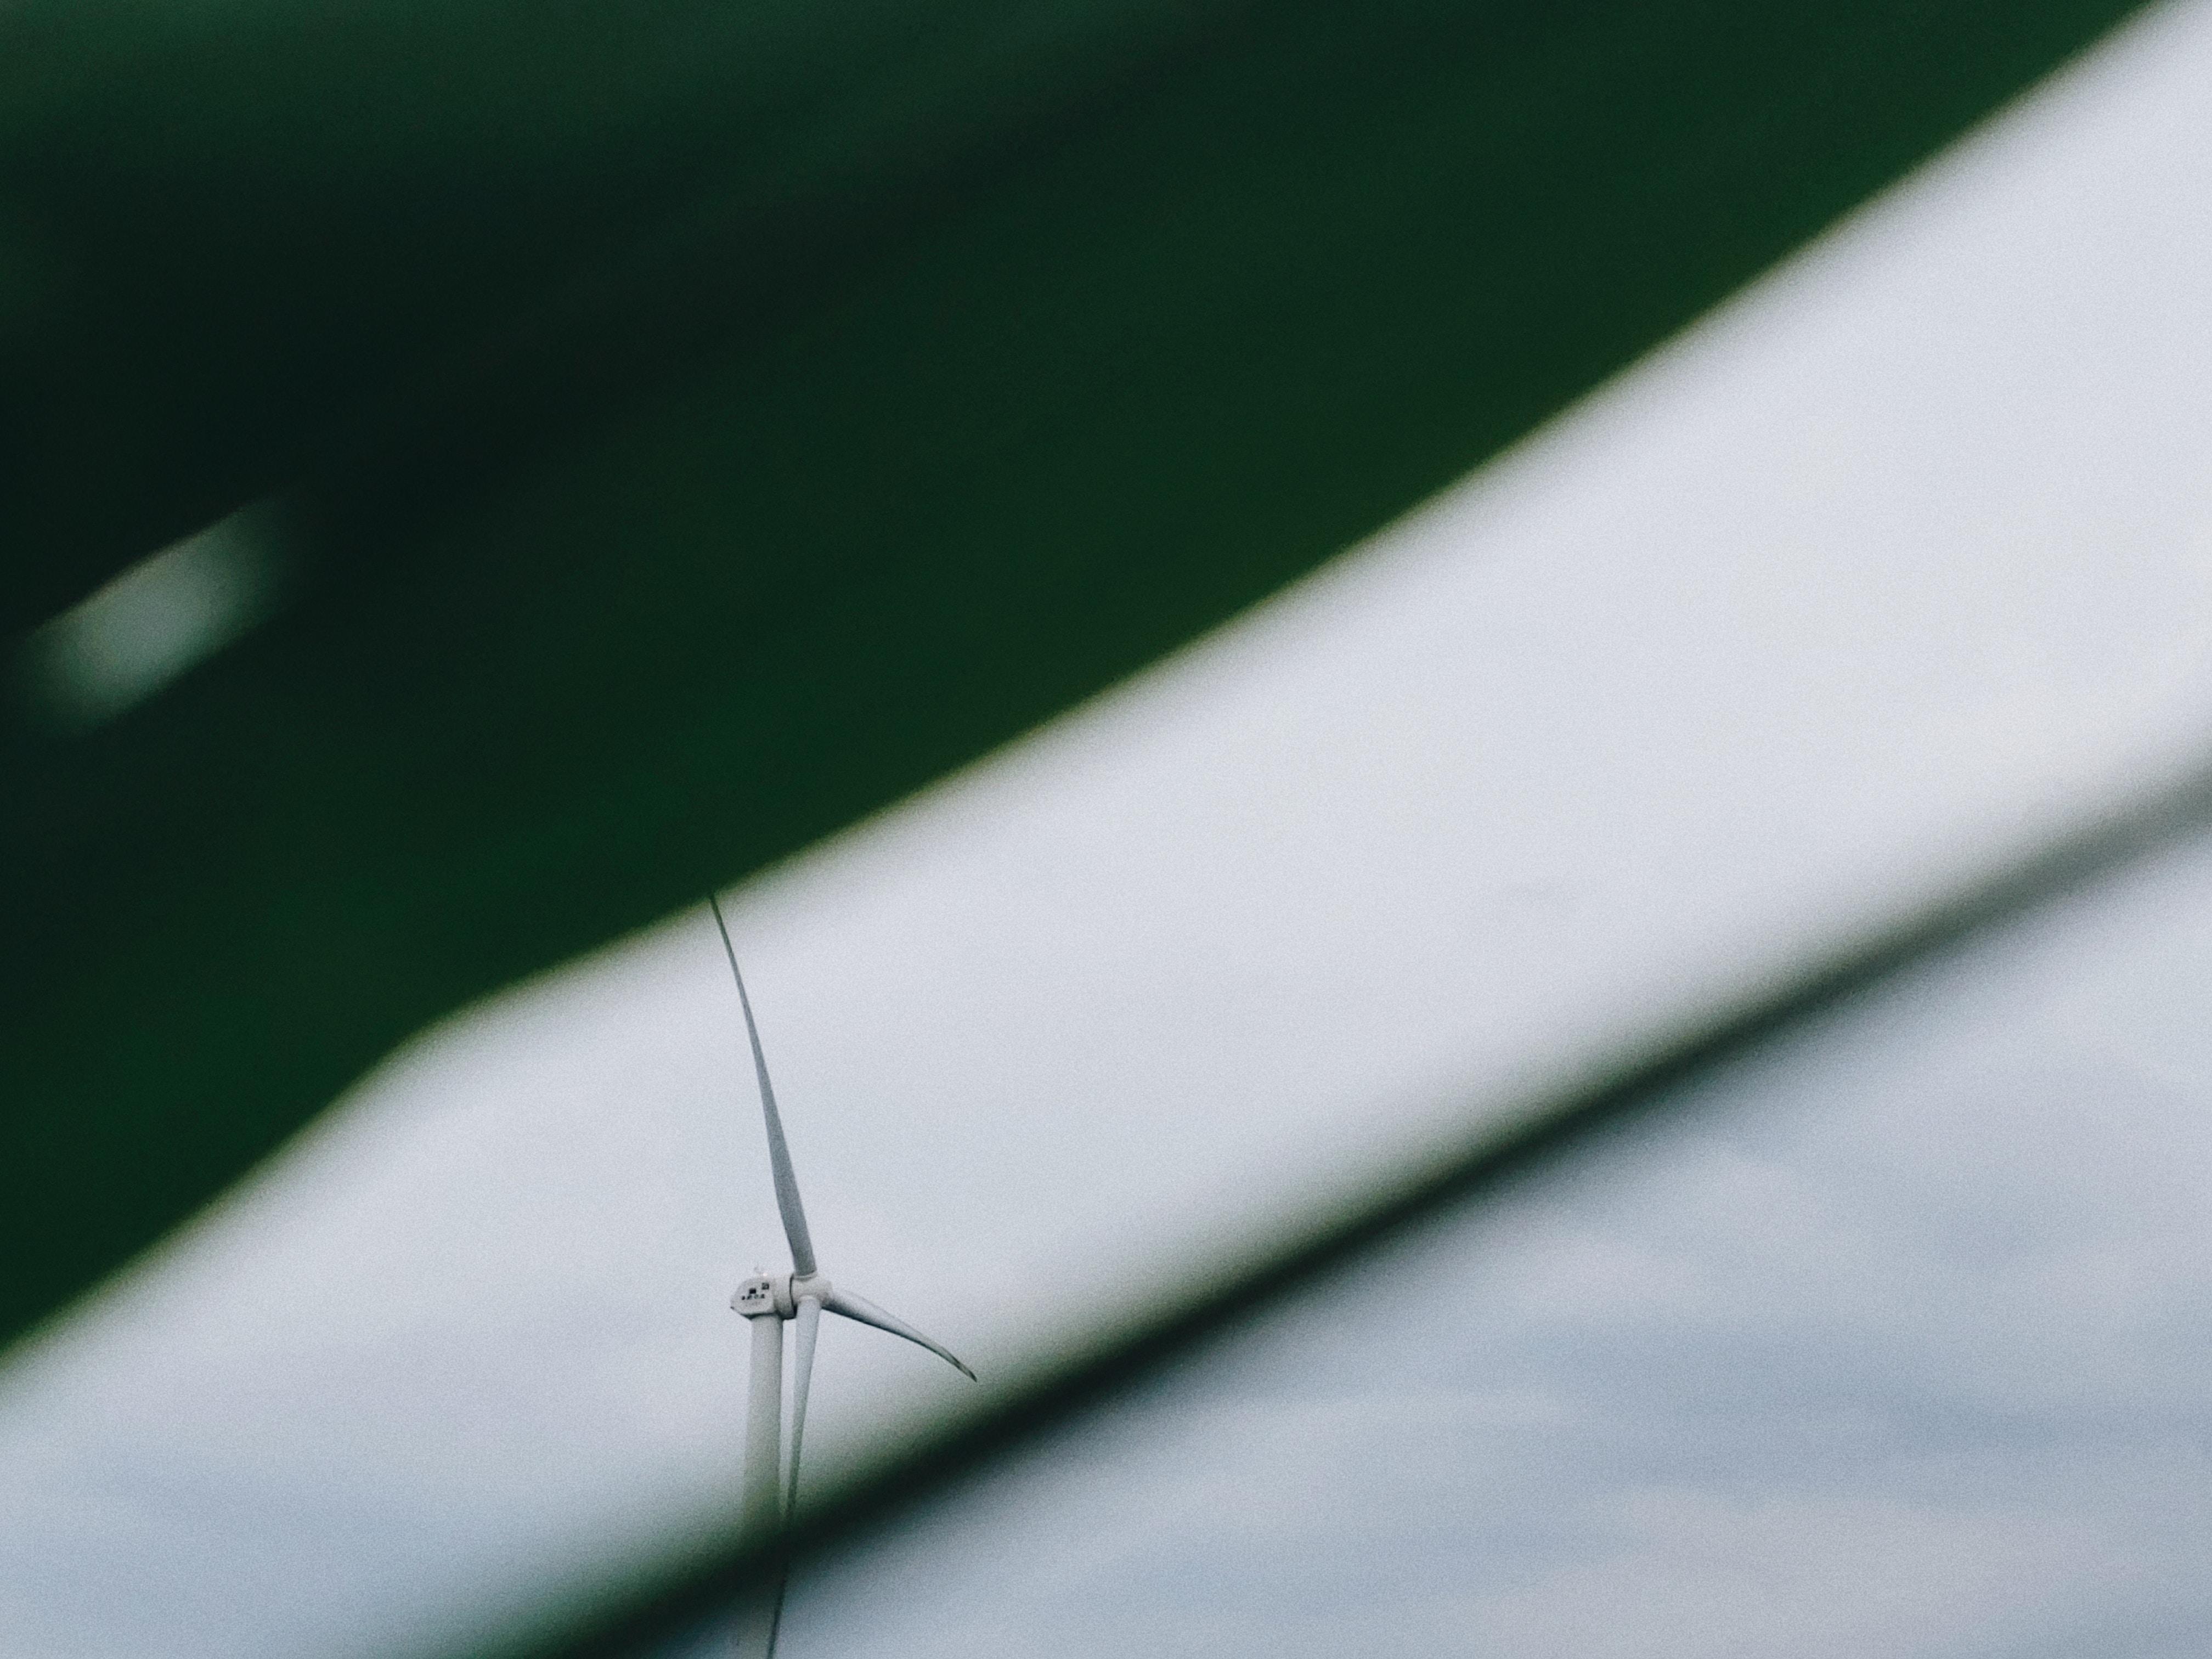 white windmill at daytime